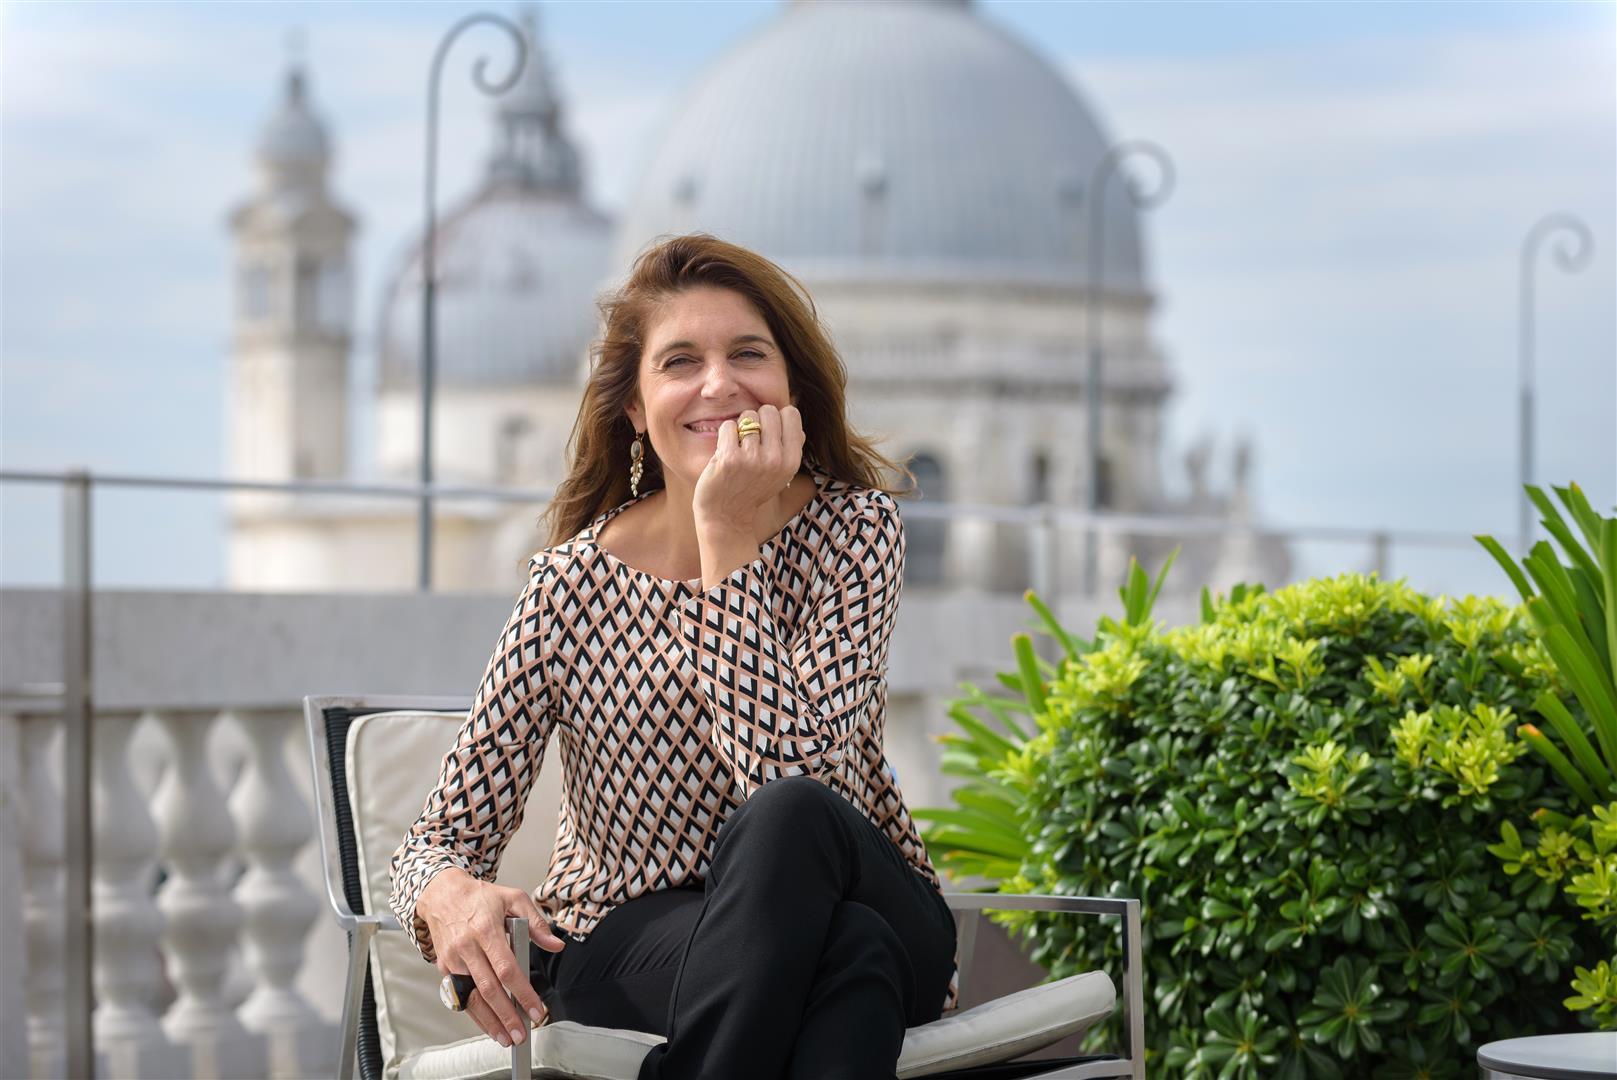 La Biennale di Venezia in mani femminili